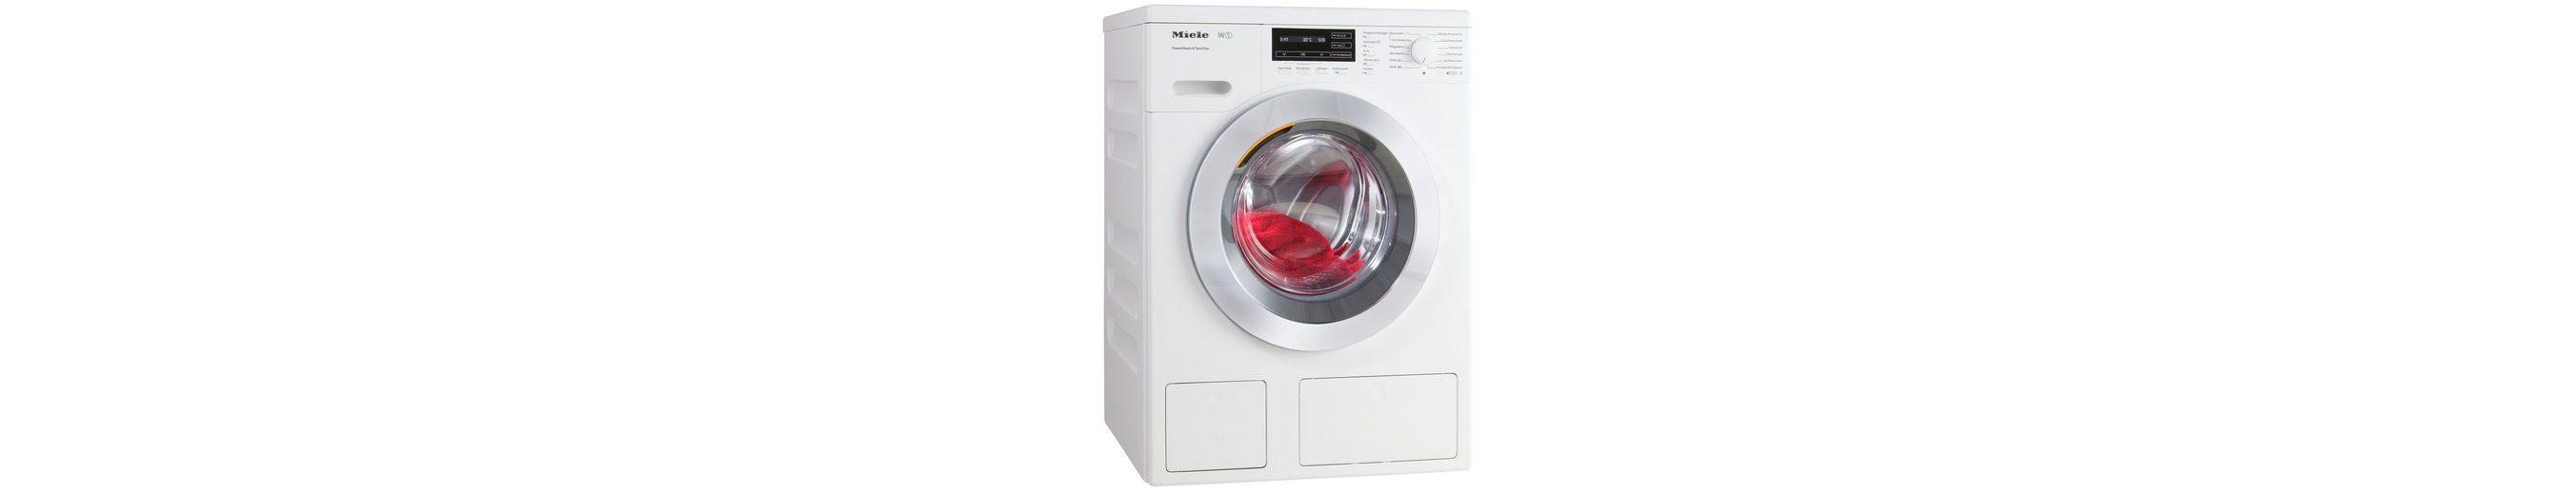 MIELE Waschmaschine WKH 121 WPS, A+++, 8 kg, 1600 U/Min